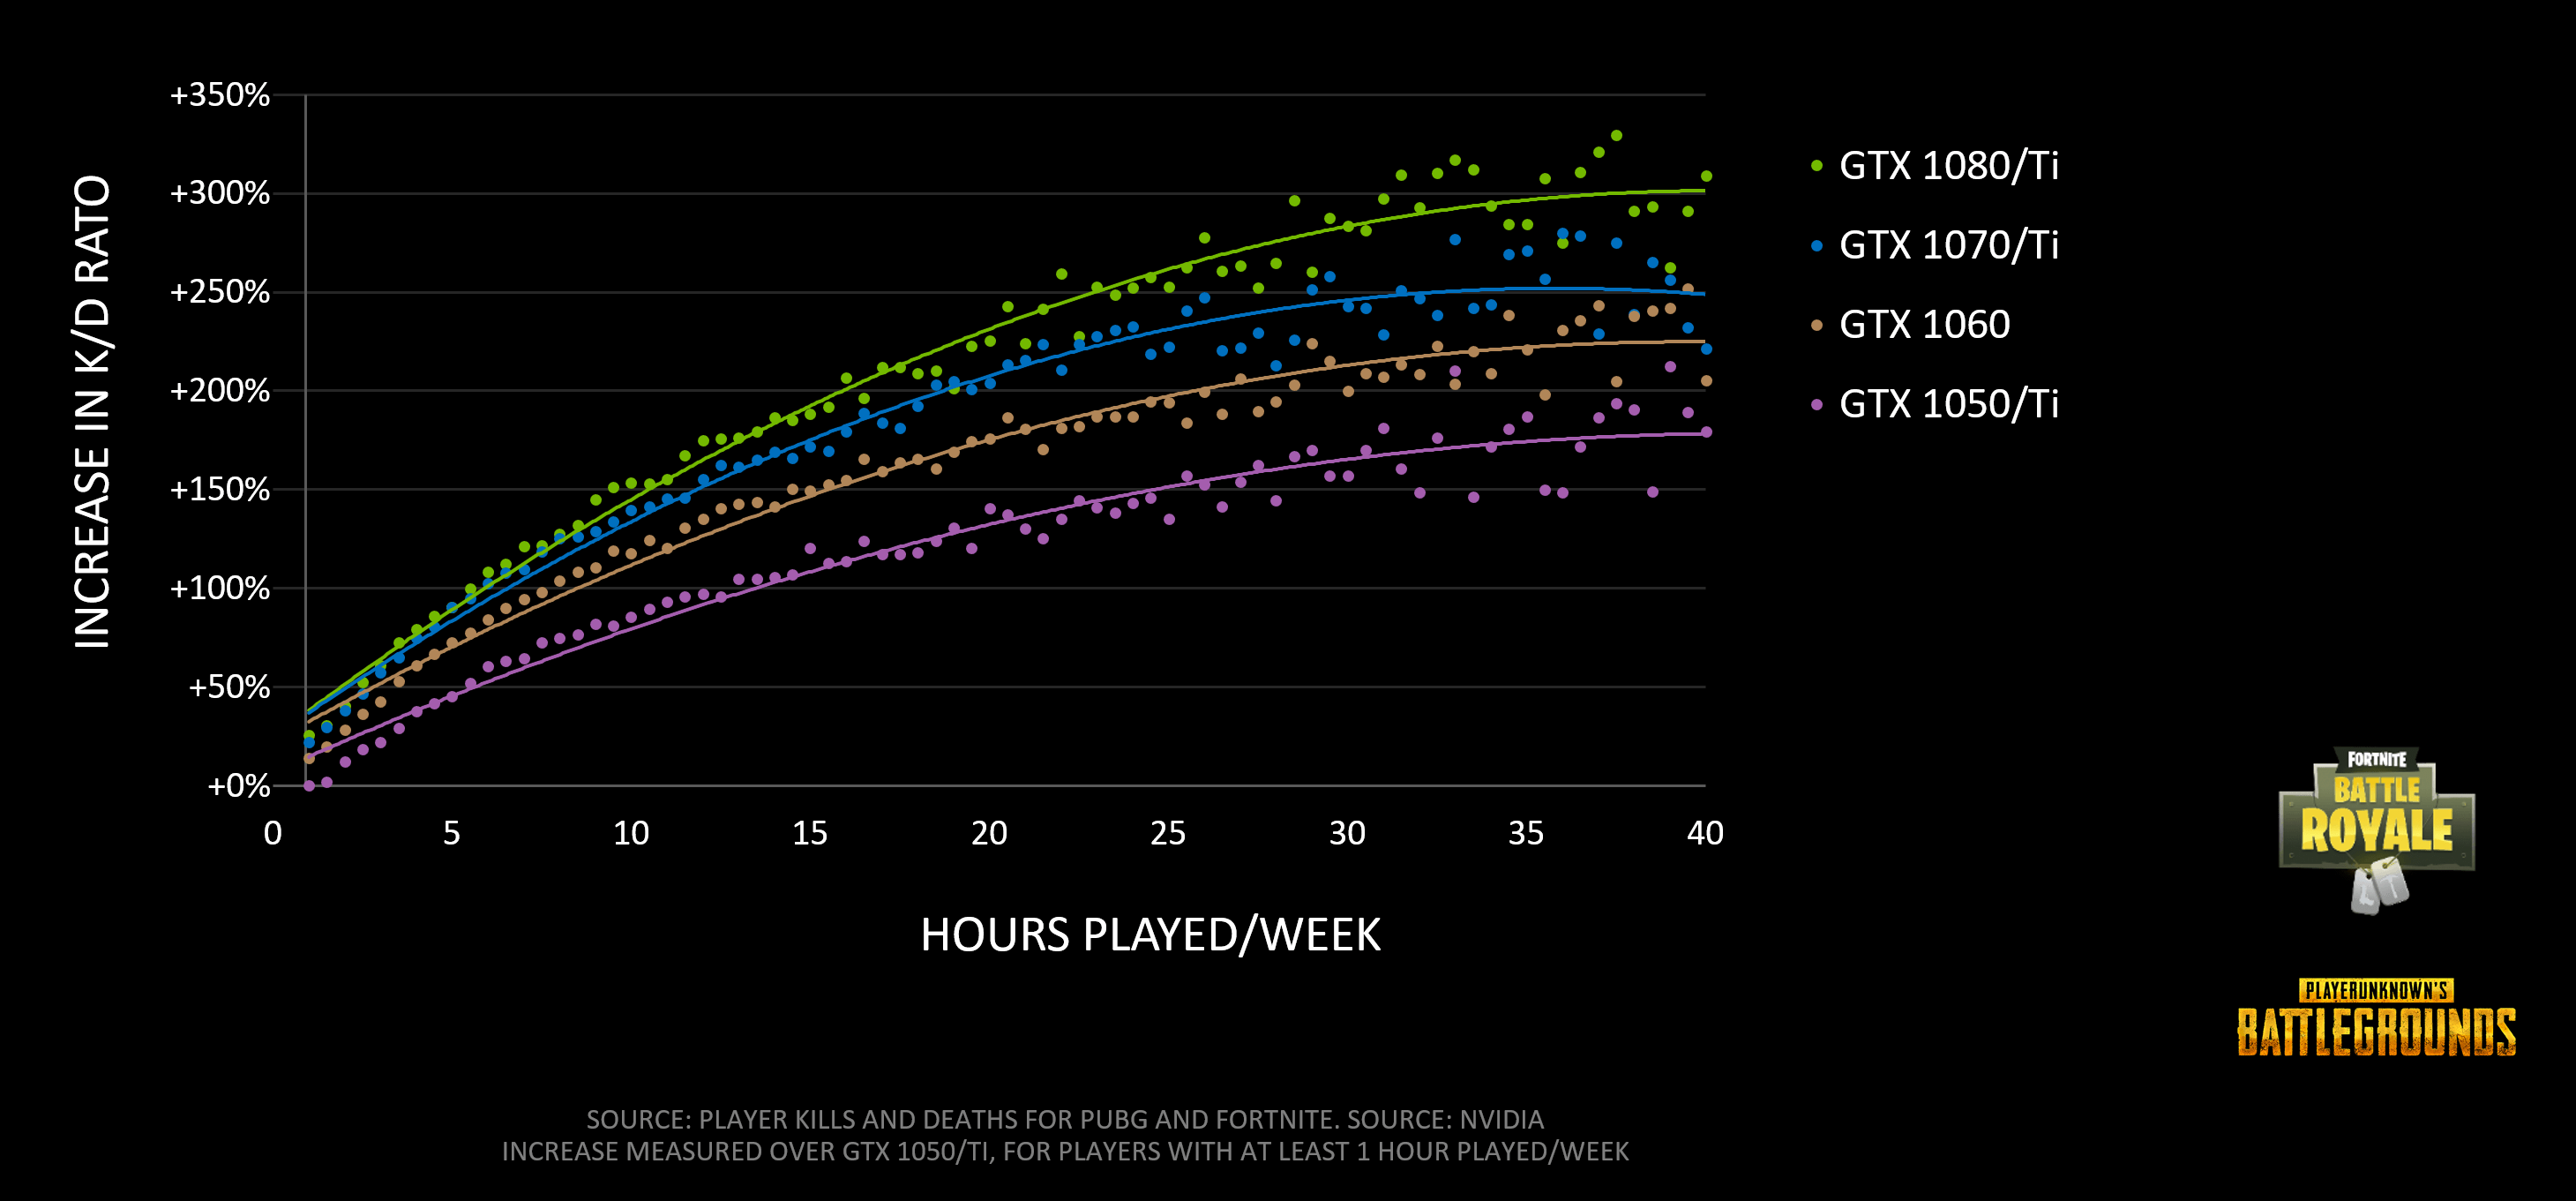 battle-royale-fortnite-pubg-increase-in-kd-hours